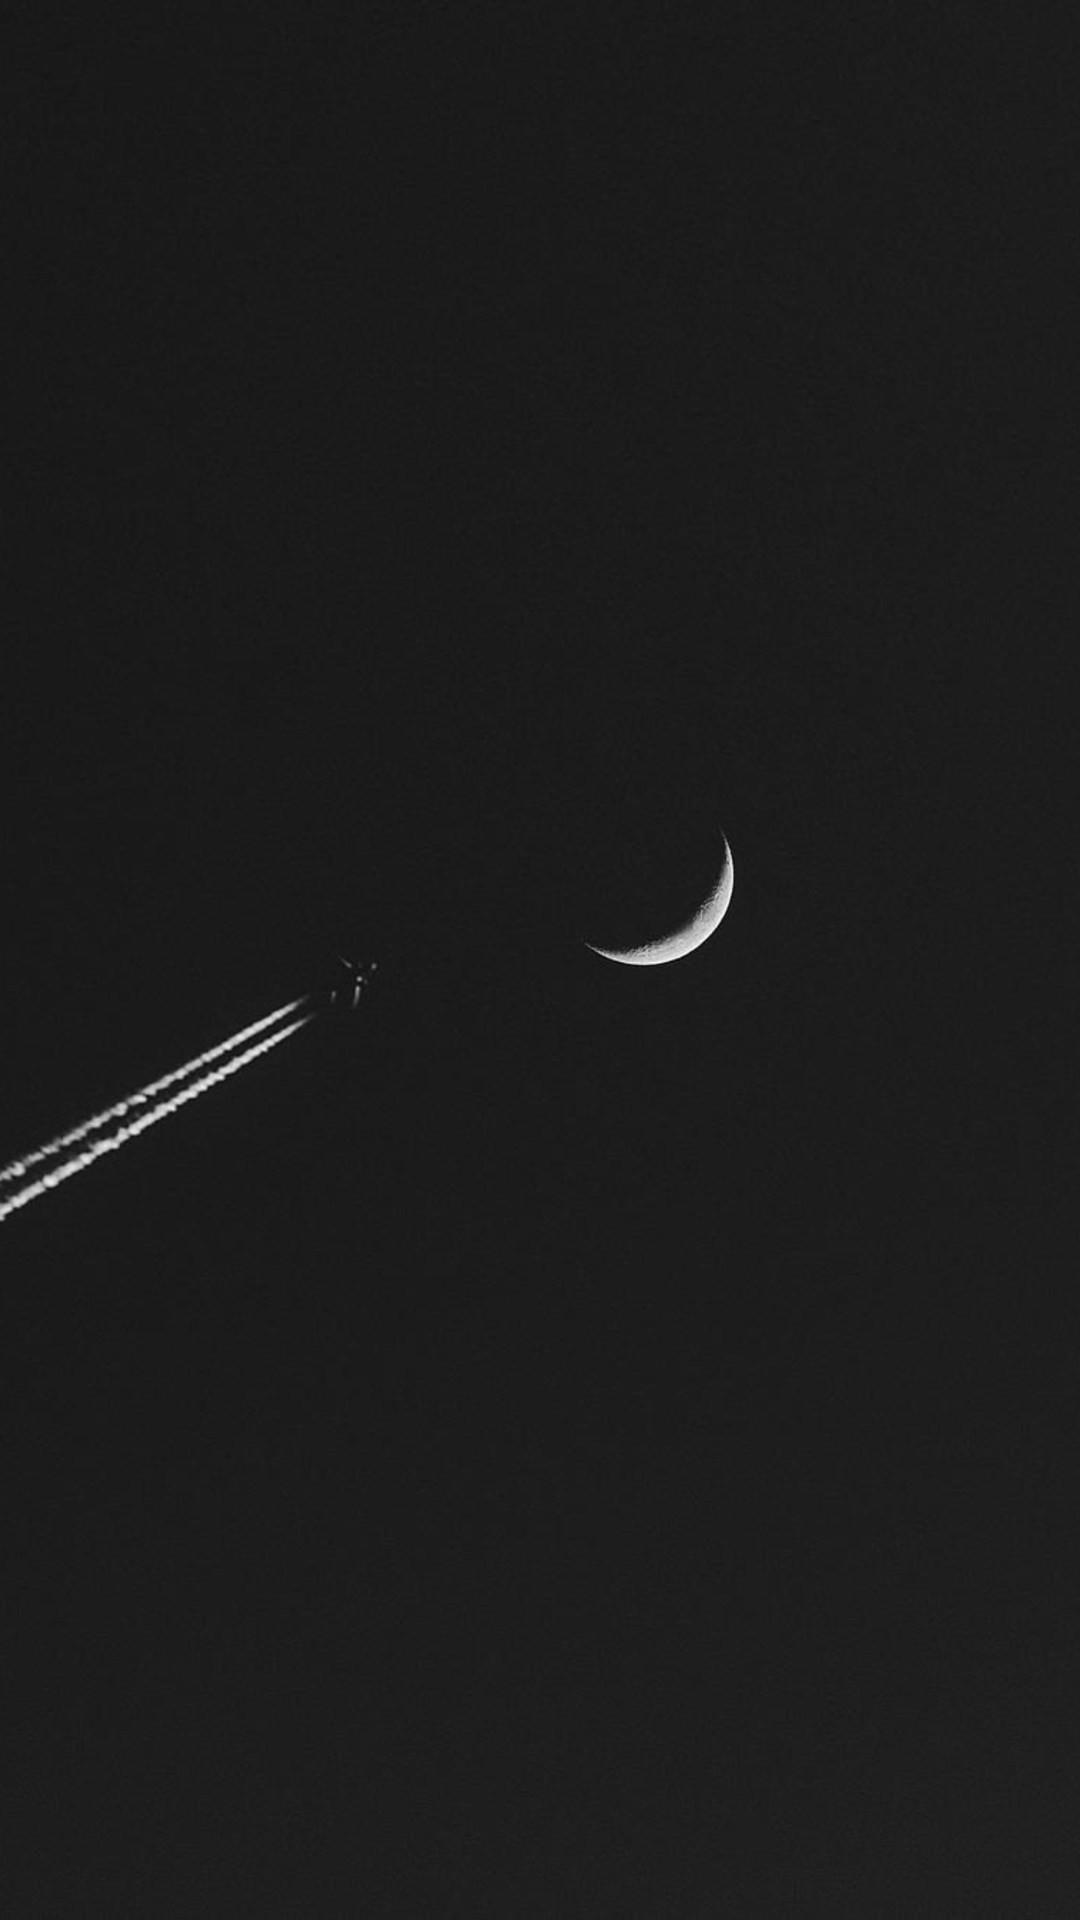 Airplane Moon Minimalism Wallpaper  1080x1920